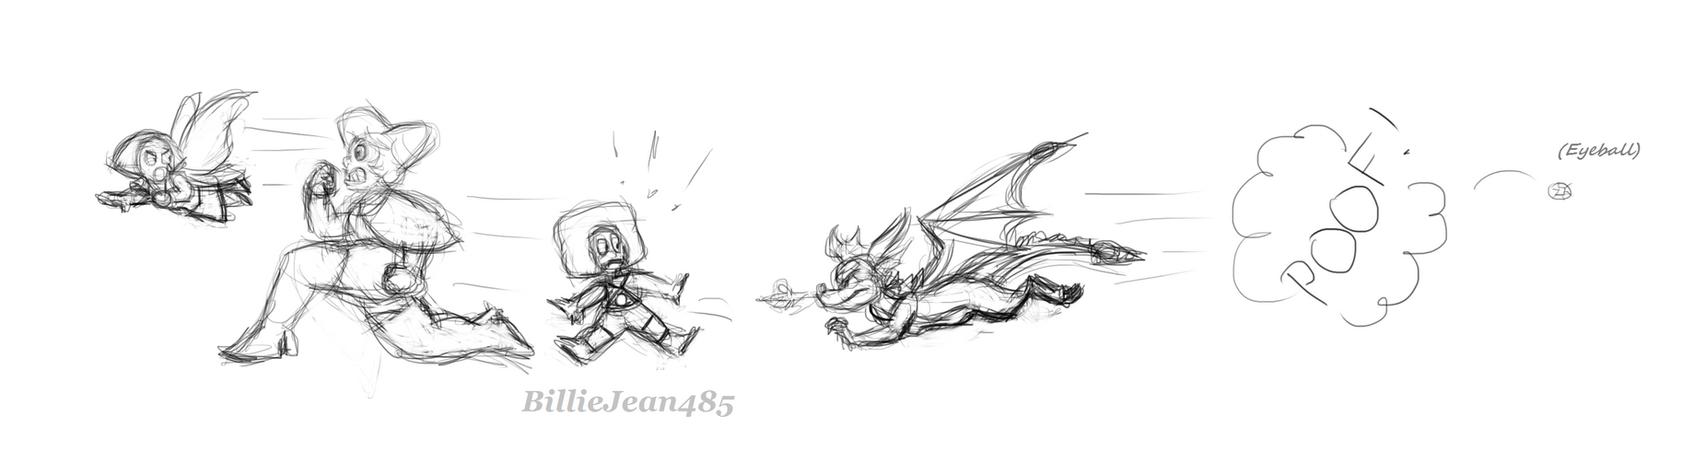 Spyro Chasing Gems by BillieJean485